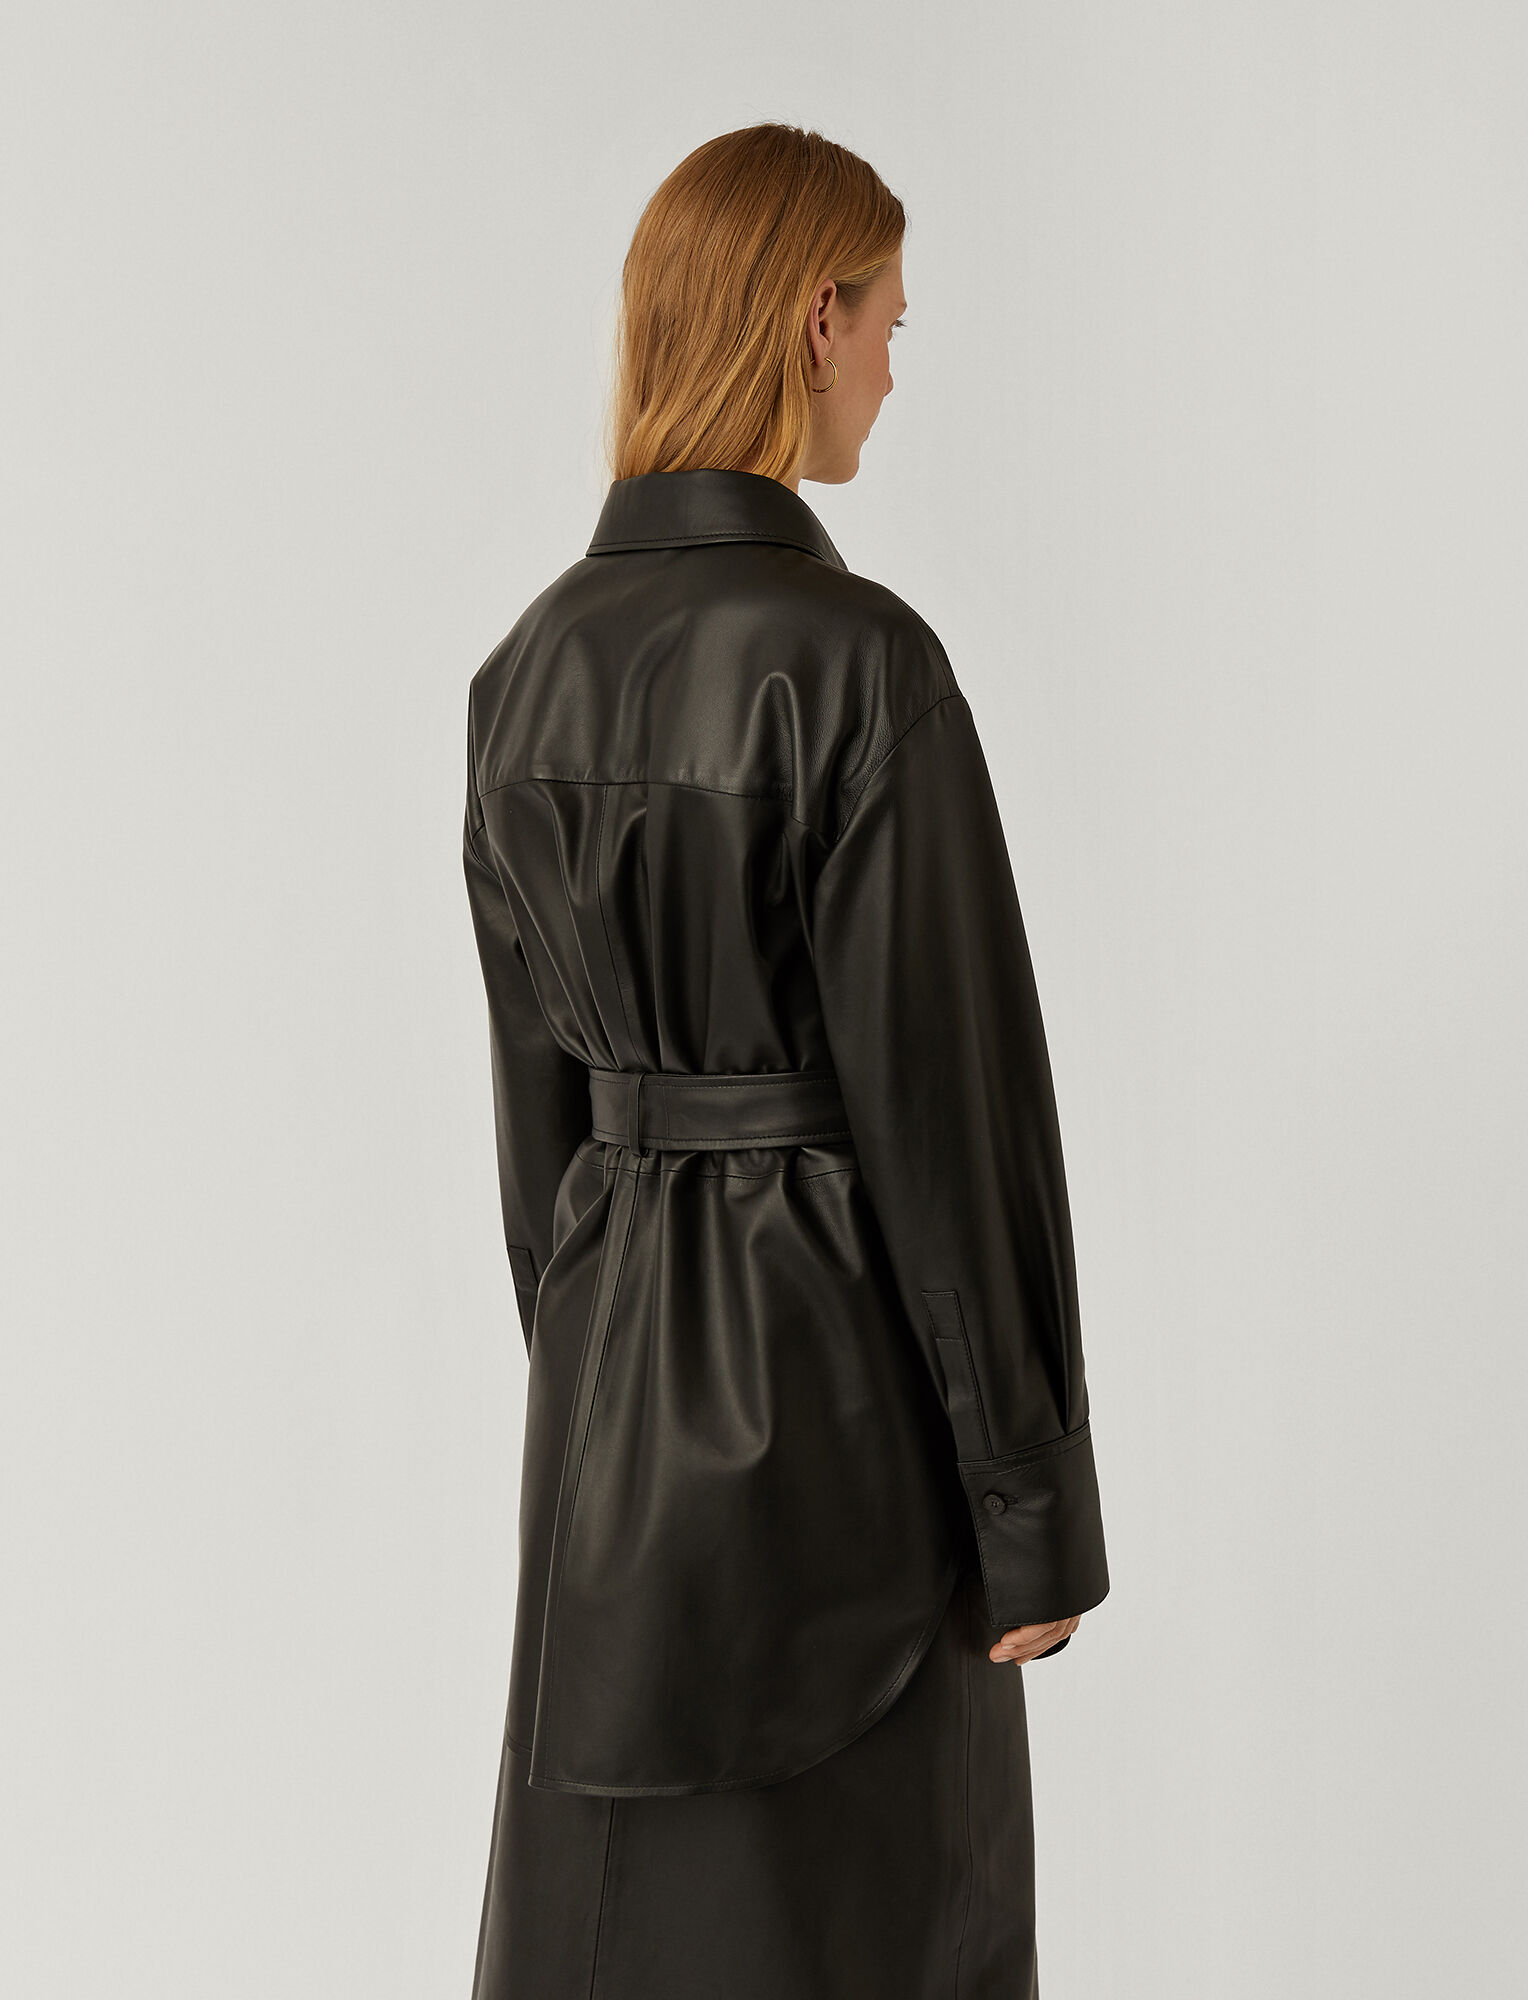 Joseph, Nappa Leather Jala Shirt, in BLACK